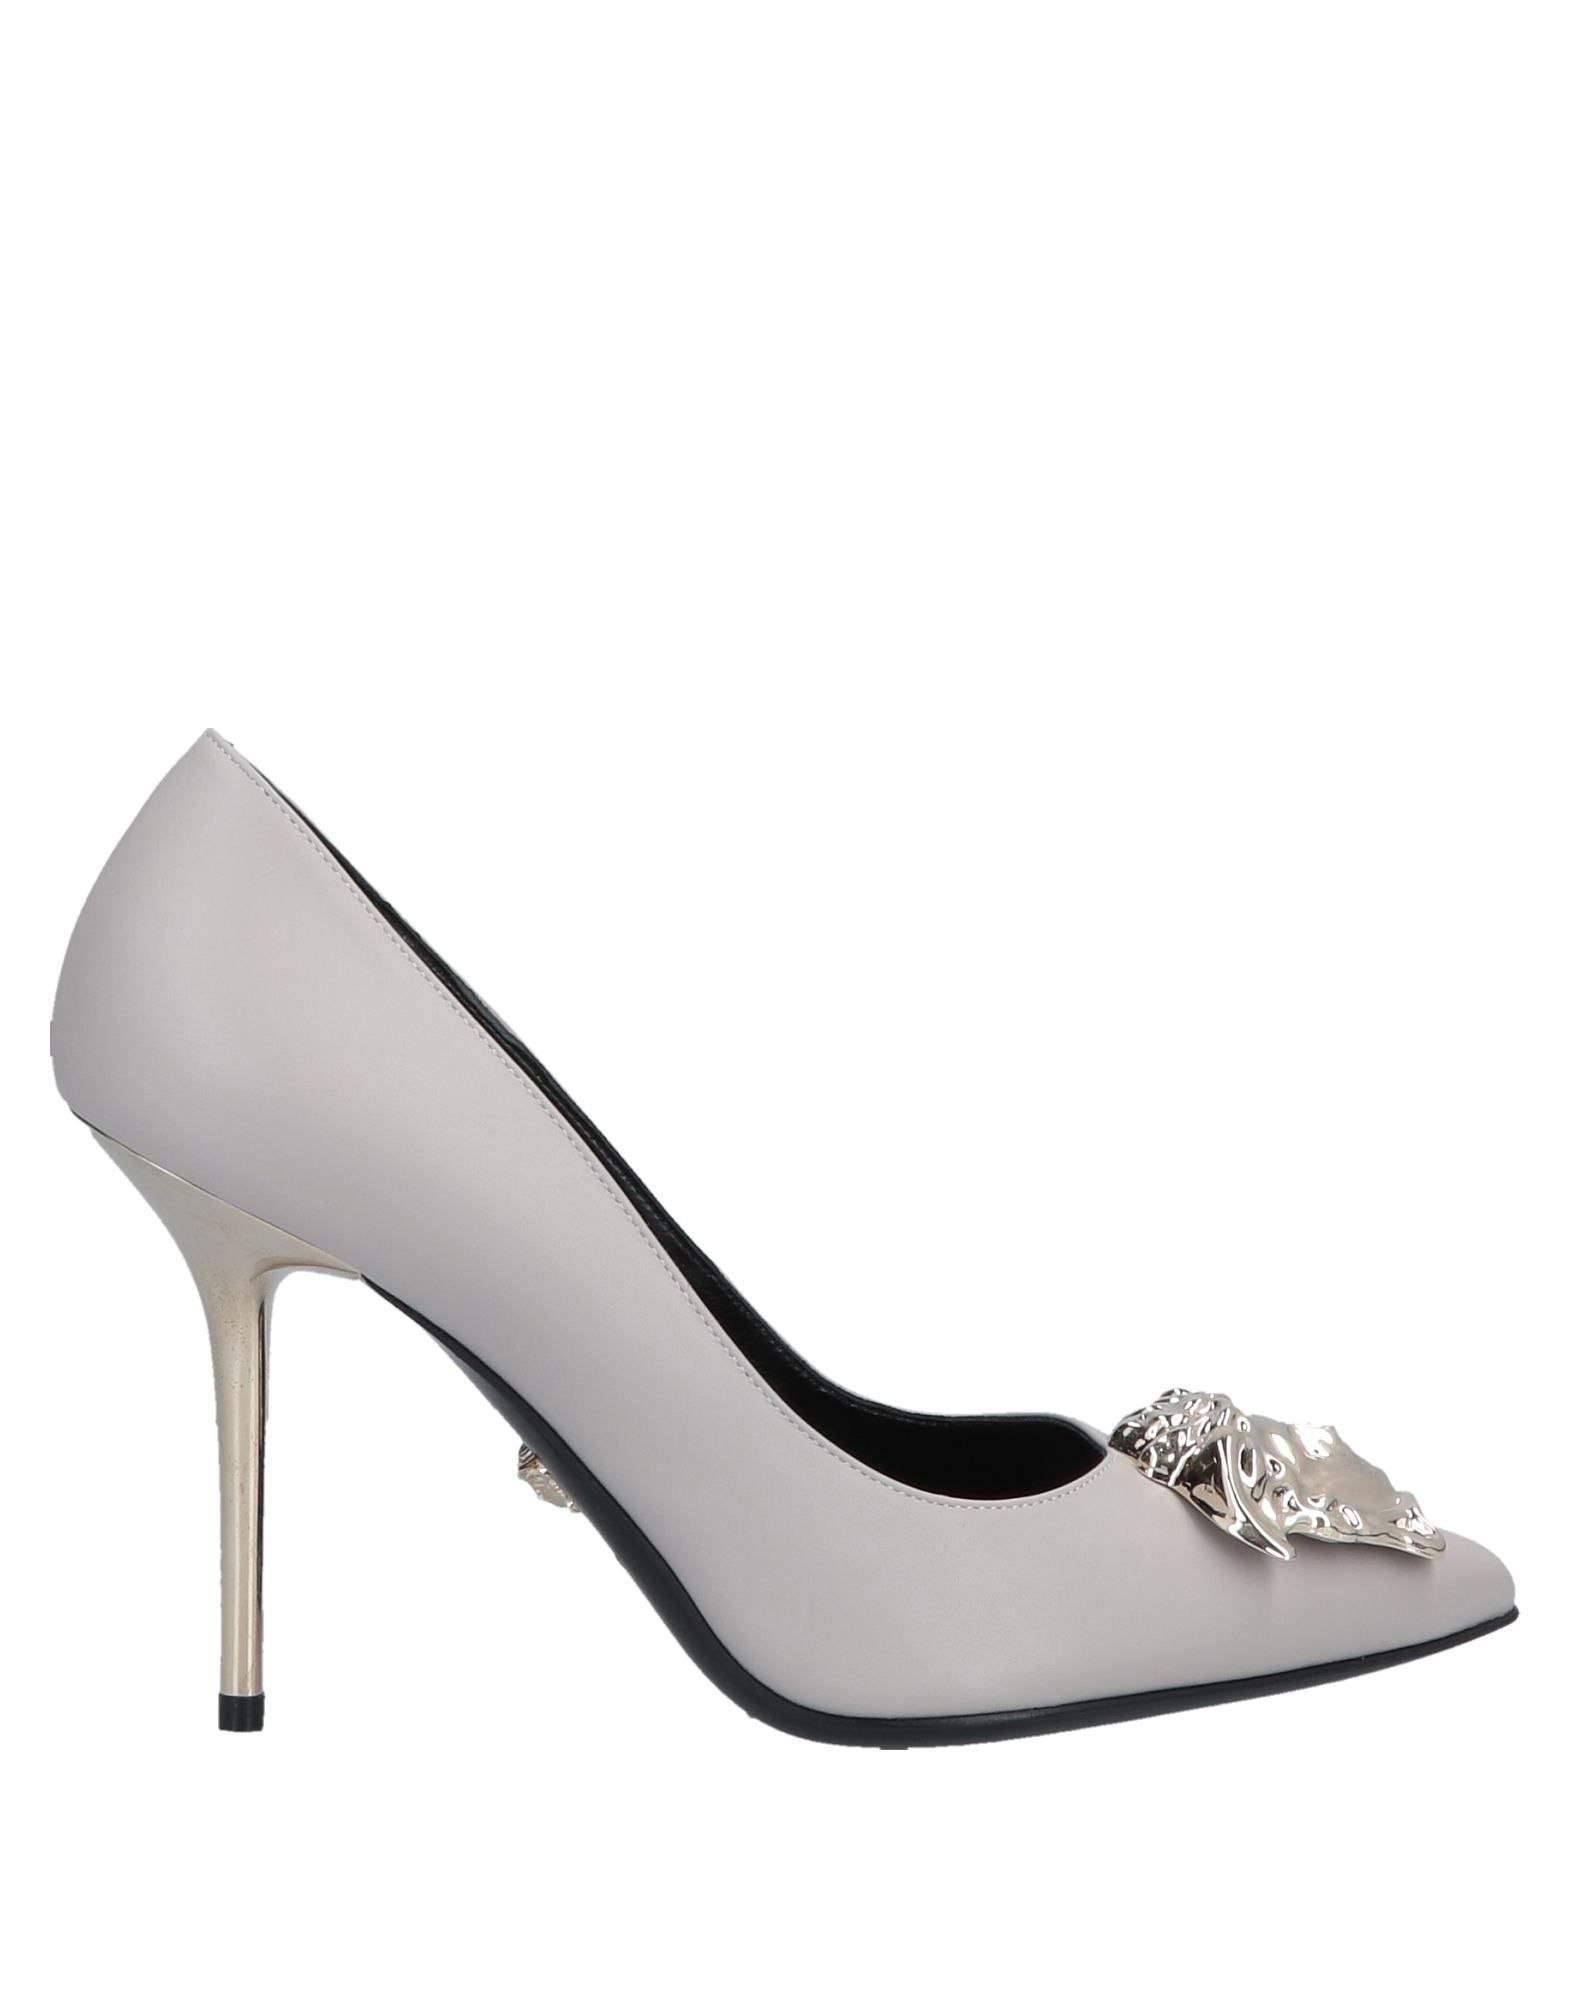 46a3489d71 Versace Pump - Women Versace Pumps online on YOOX United States ...